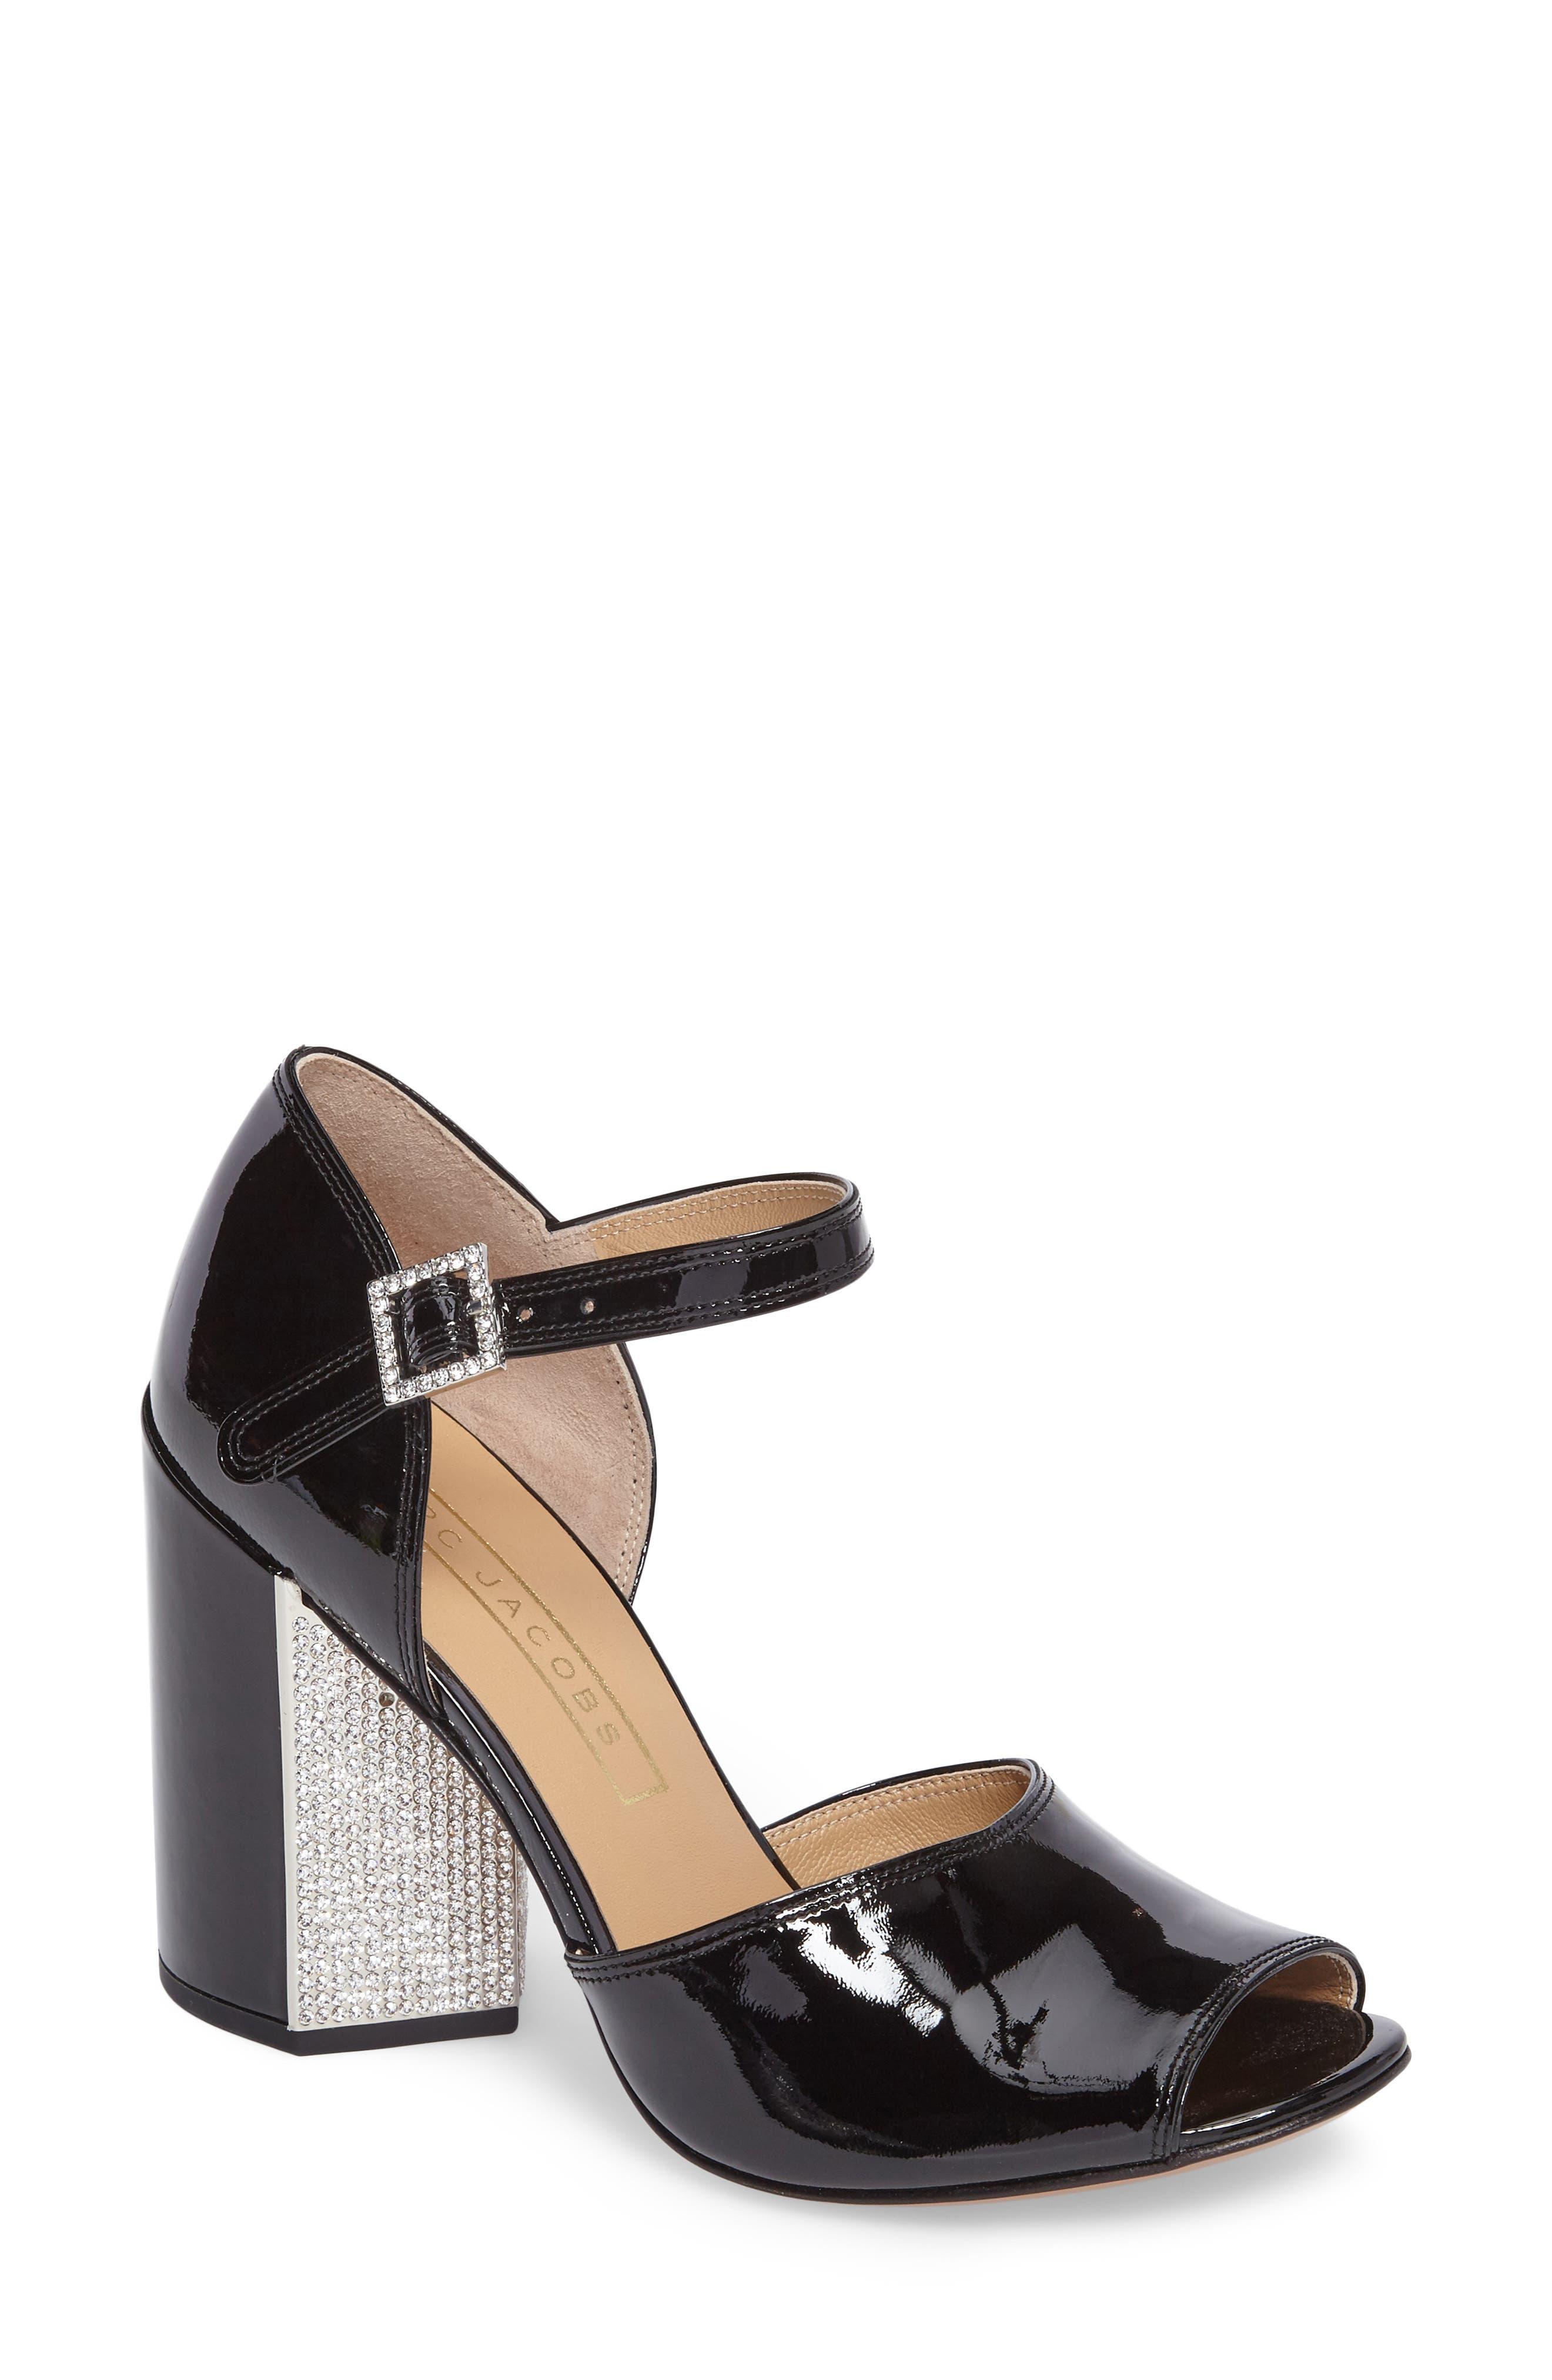 Women's MARC JACOBS Shoes | Nordstrom